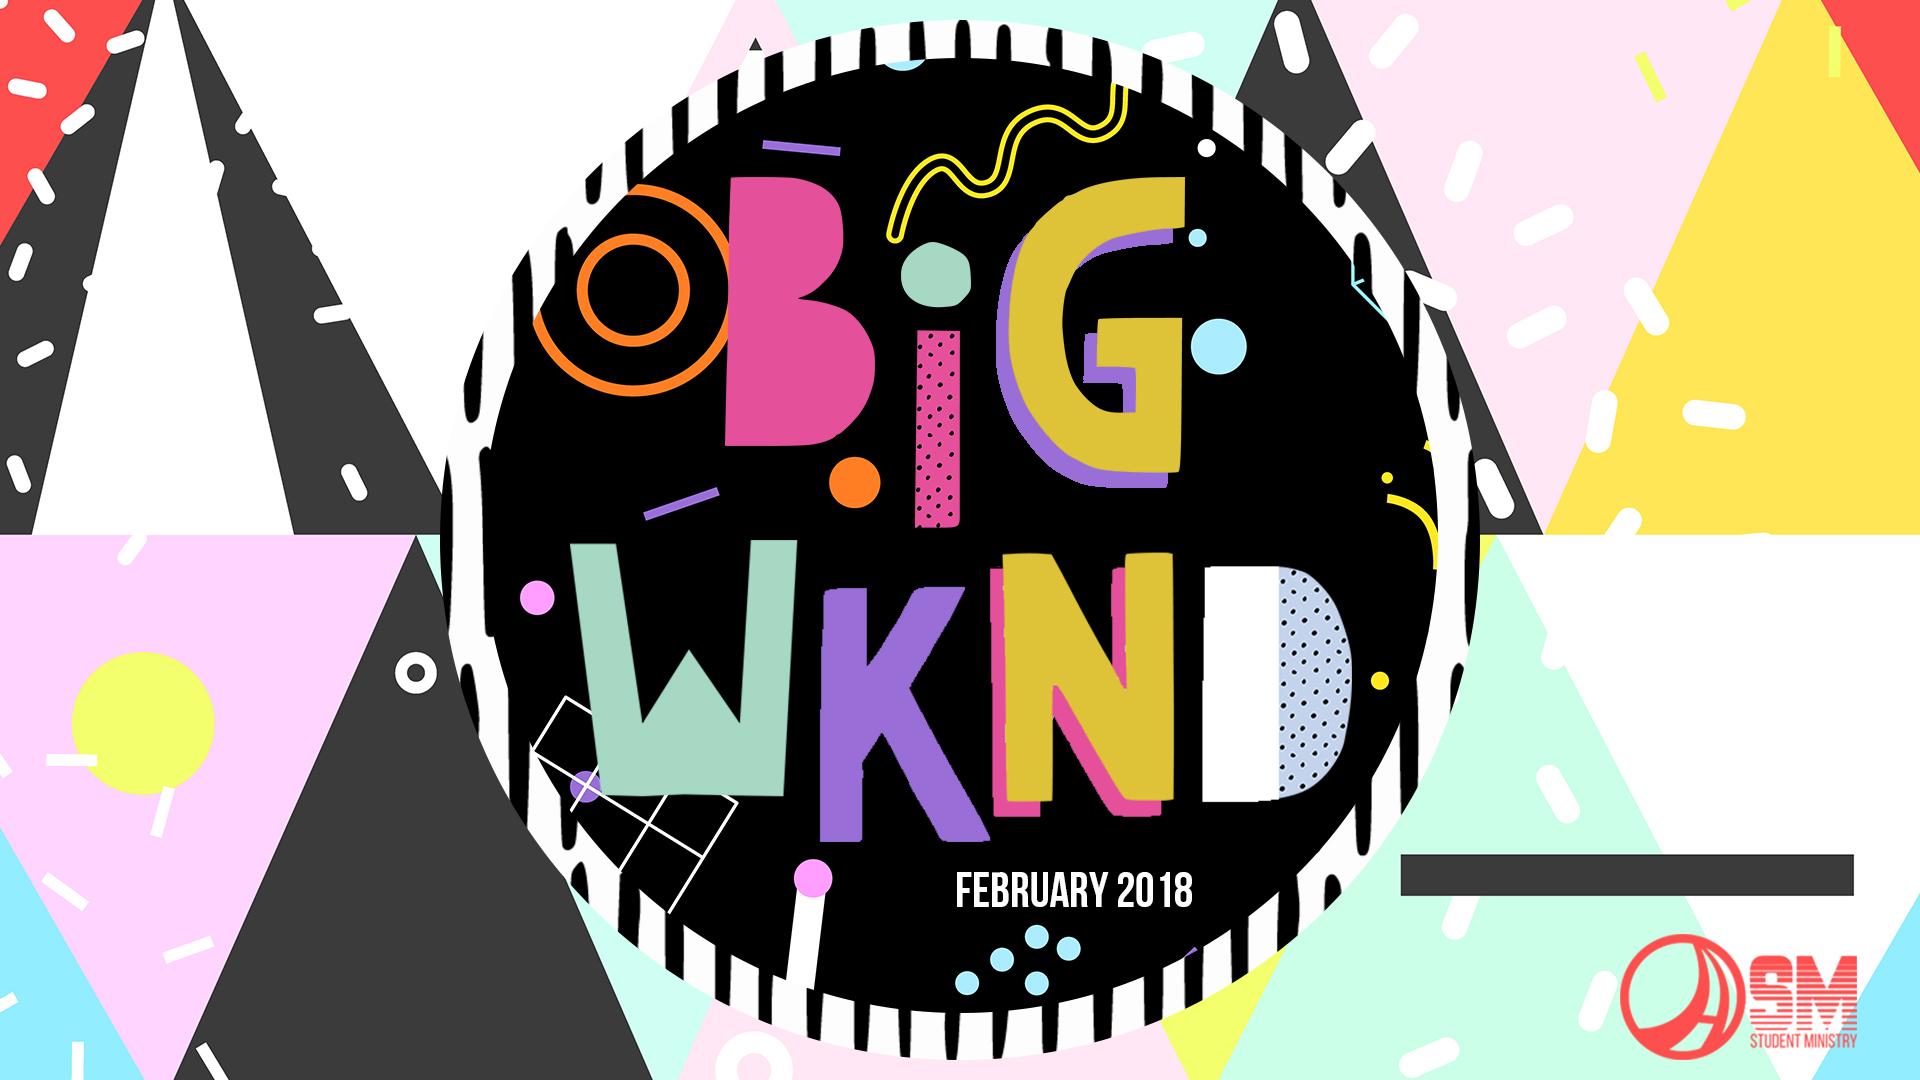 Big wknd 2018 slide